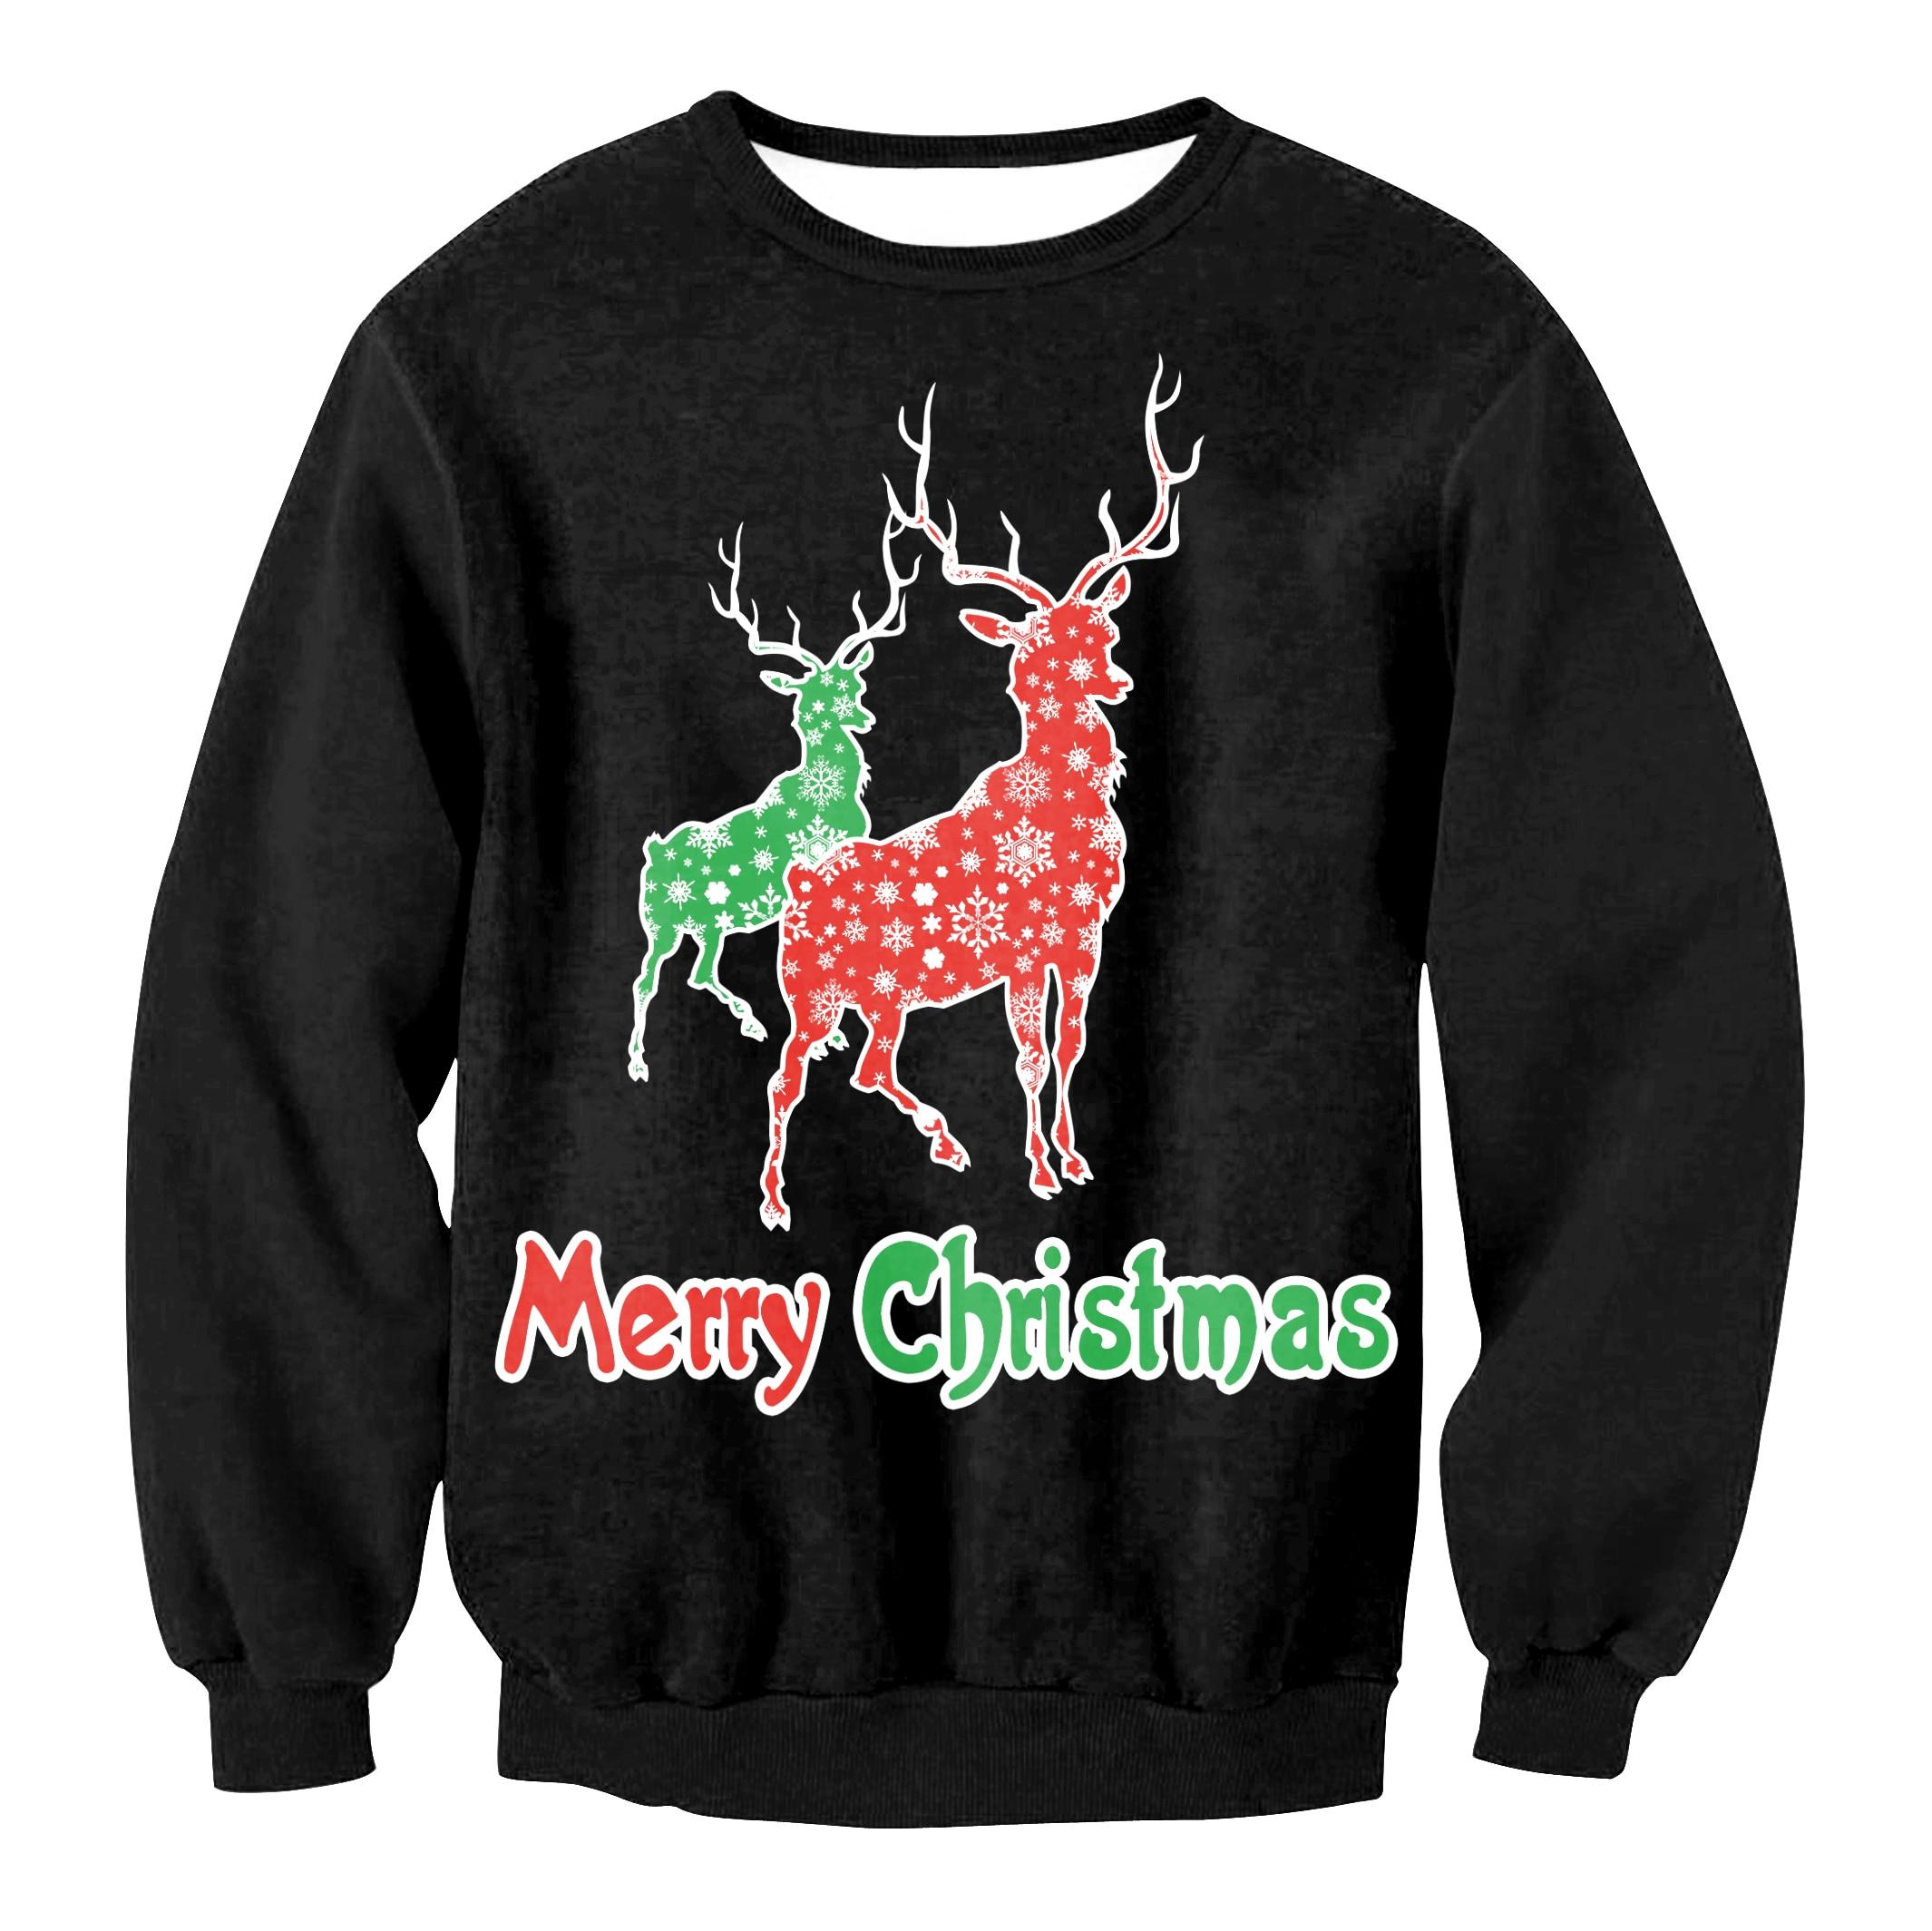 Online Get Cheap Sports Christmas Sweaters -Aliexpress.com ...